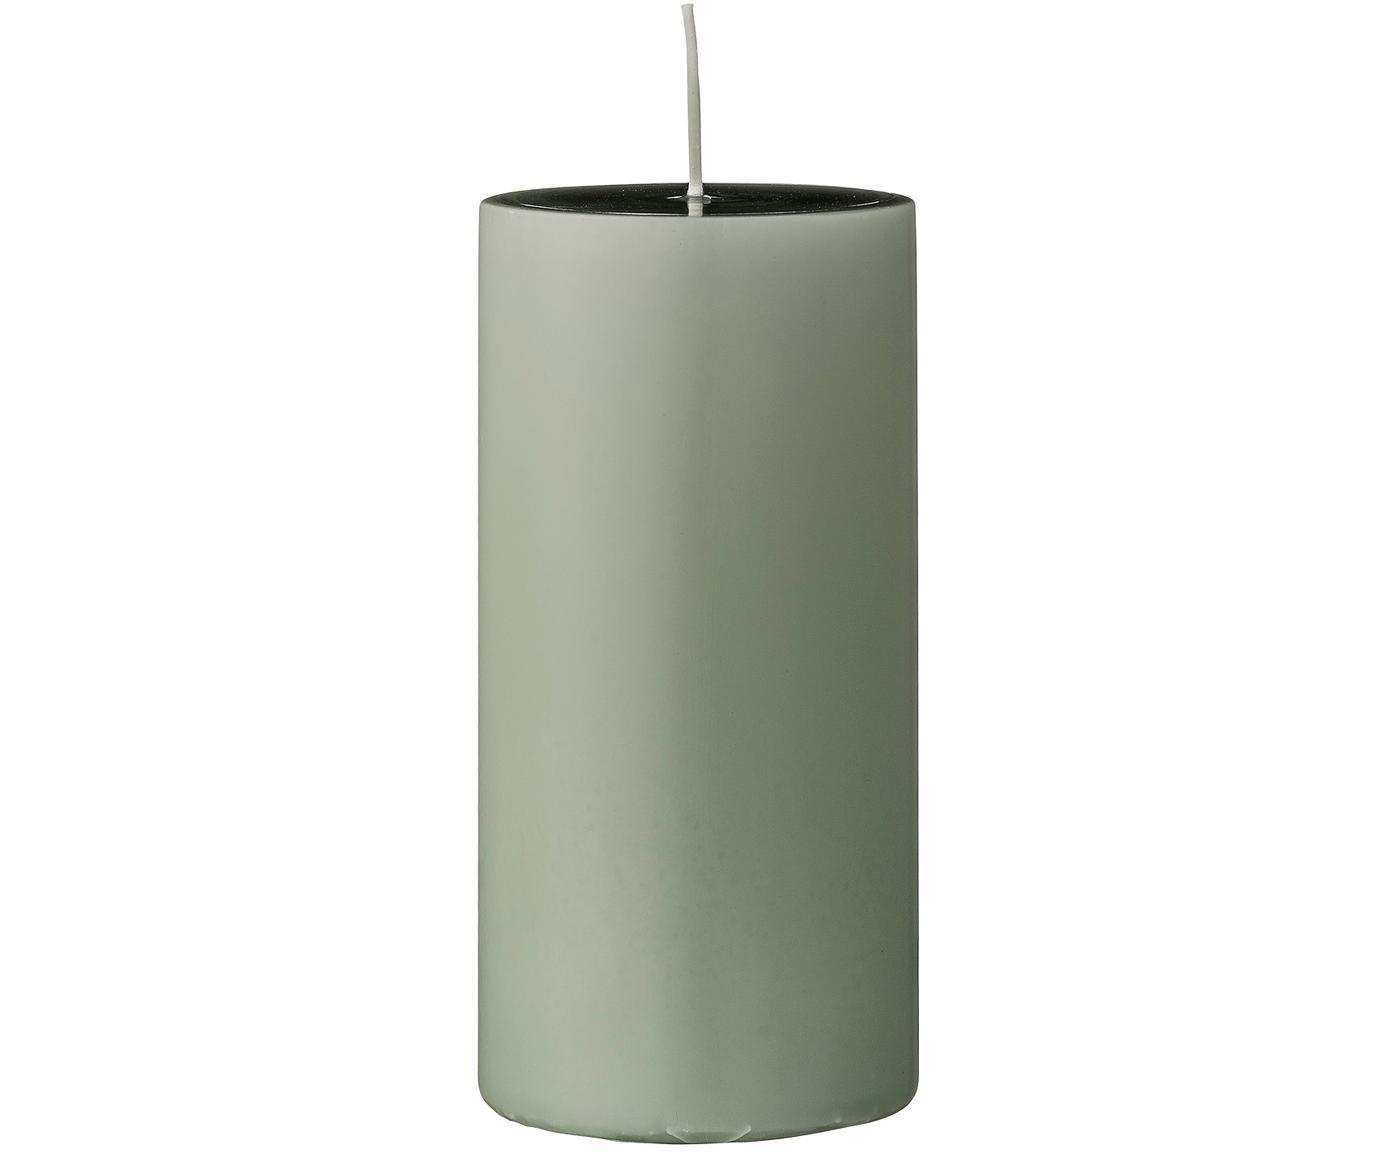 Stompkaarsen Lulu, 2 stuks, Was, Lichtgroen, Ø 7 cm